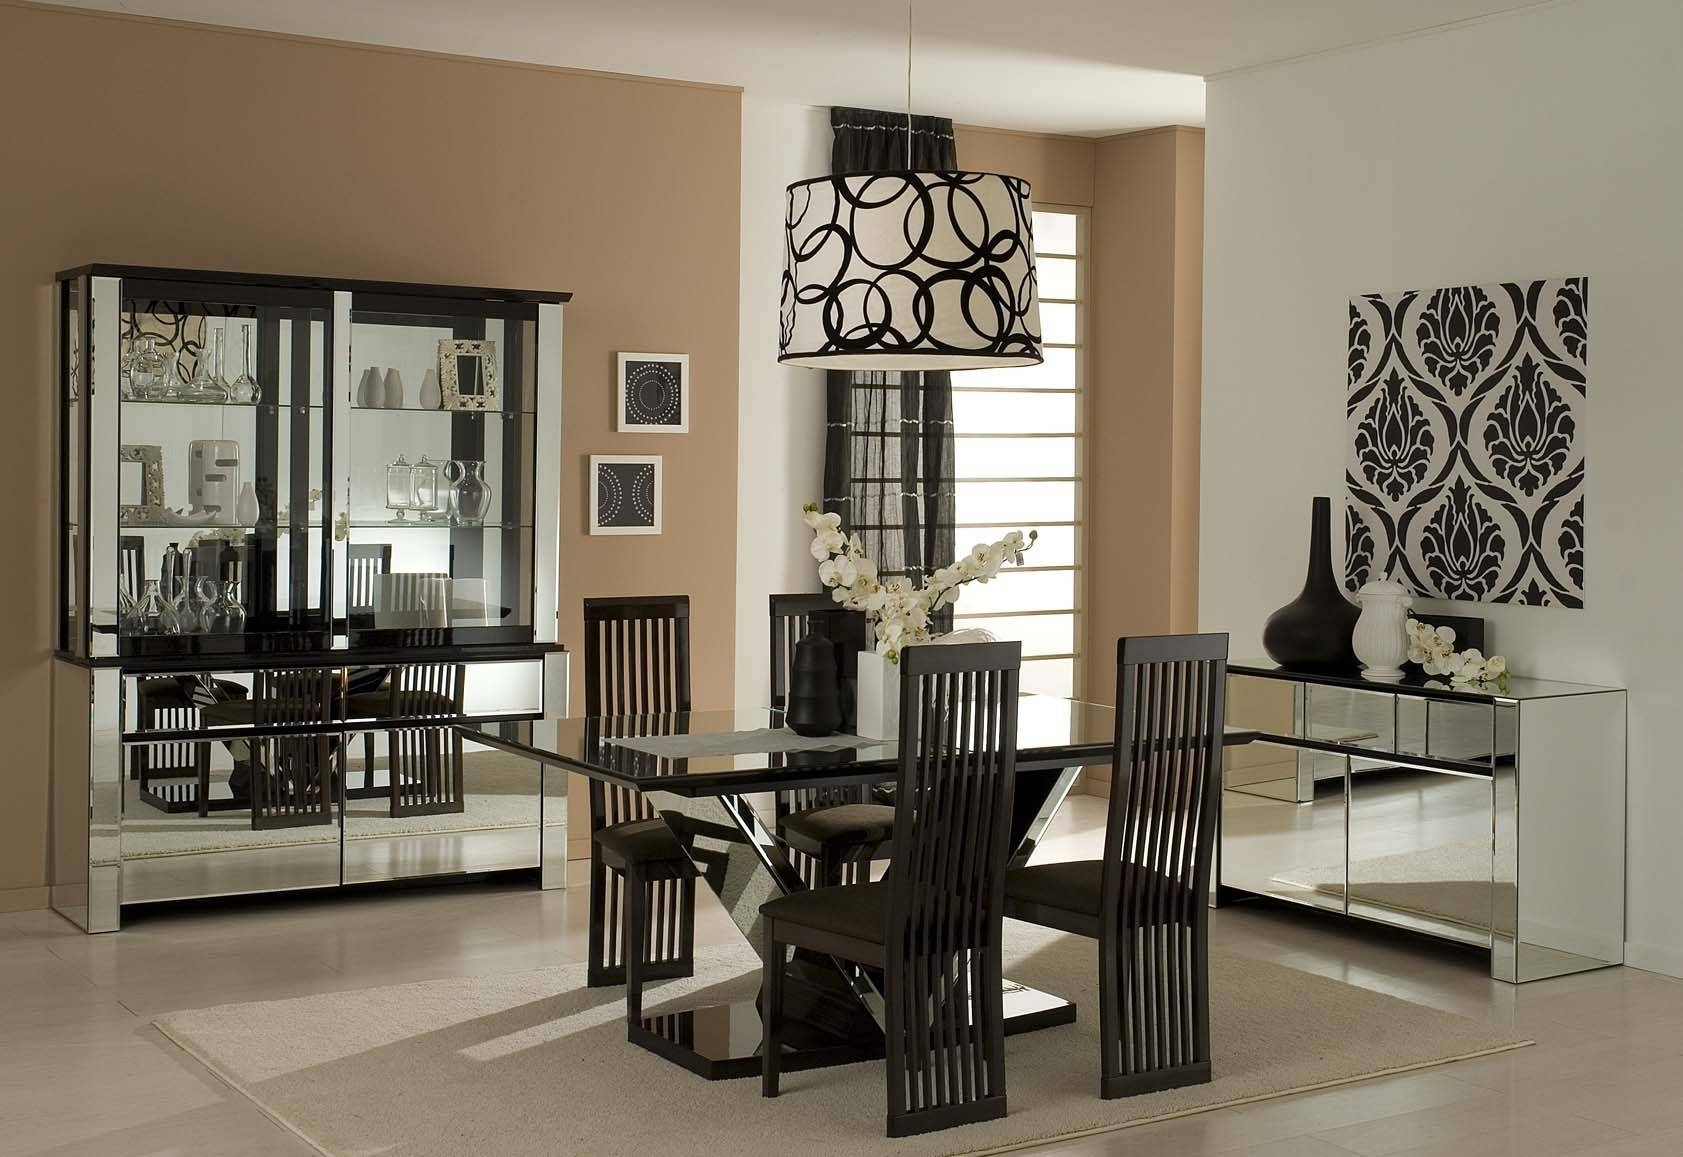 Modern Dining Room Decor Ideas Luxury Dining Room Decor Ideas For 2018 Modern Wall Art For Dining Room (View 10 of 15)